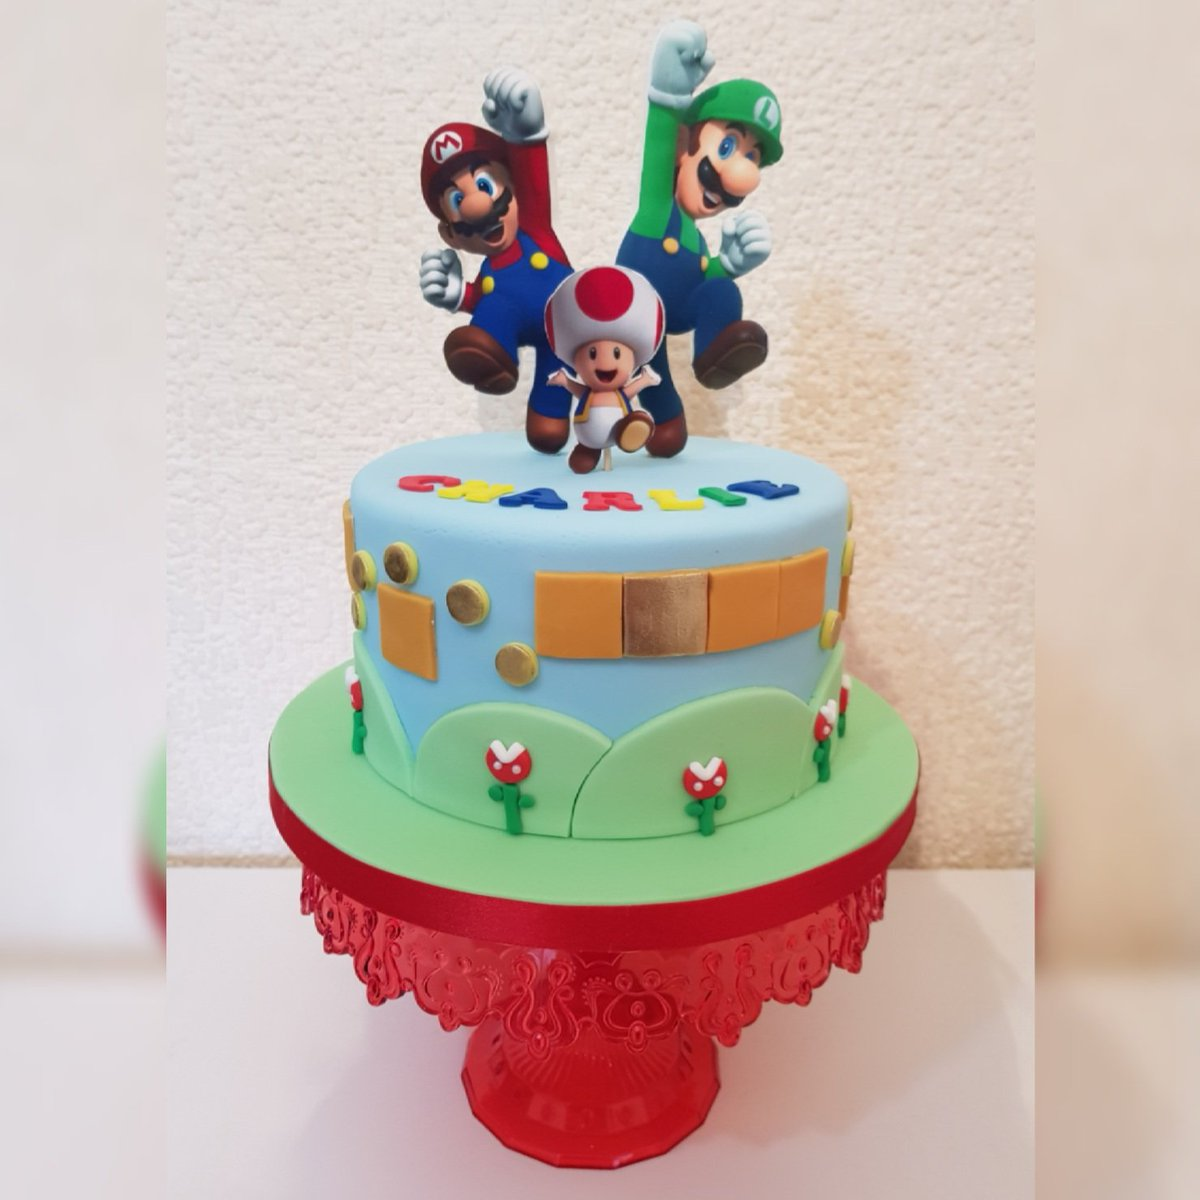 Remarkable Auntie Cake On Twitter Mario Cake For My Nephews 5Th Birthday Personalised Birthday Cards Veneteletsinfo